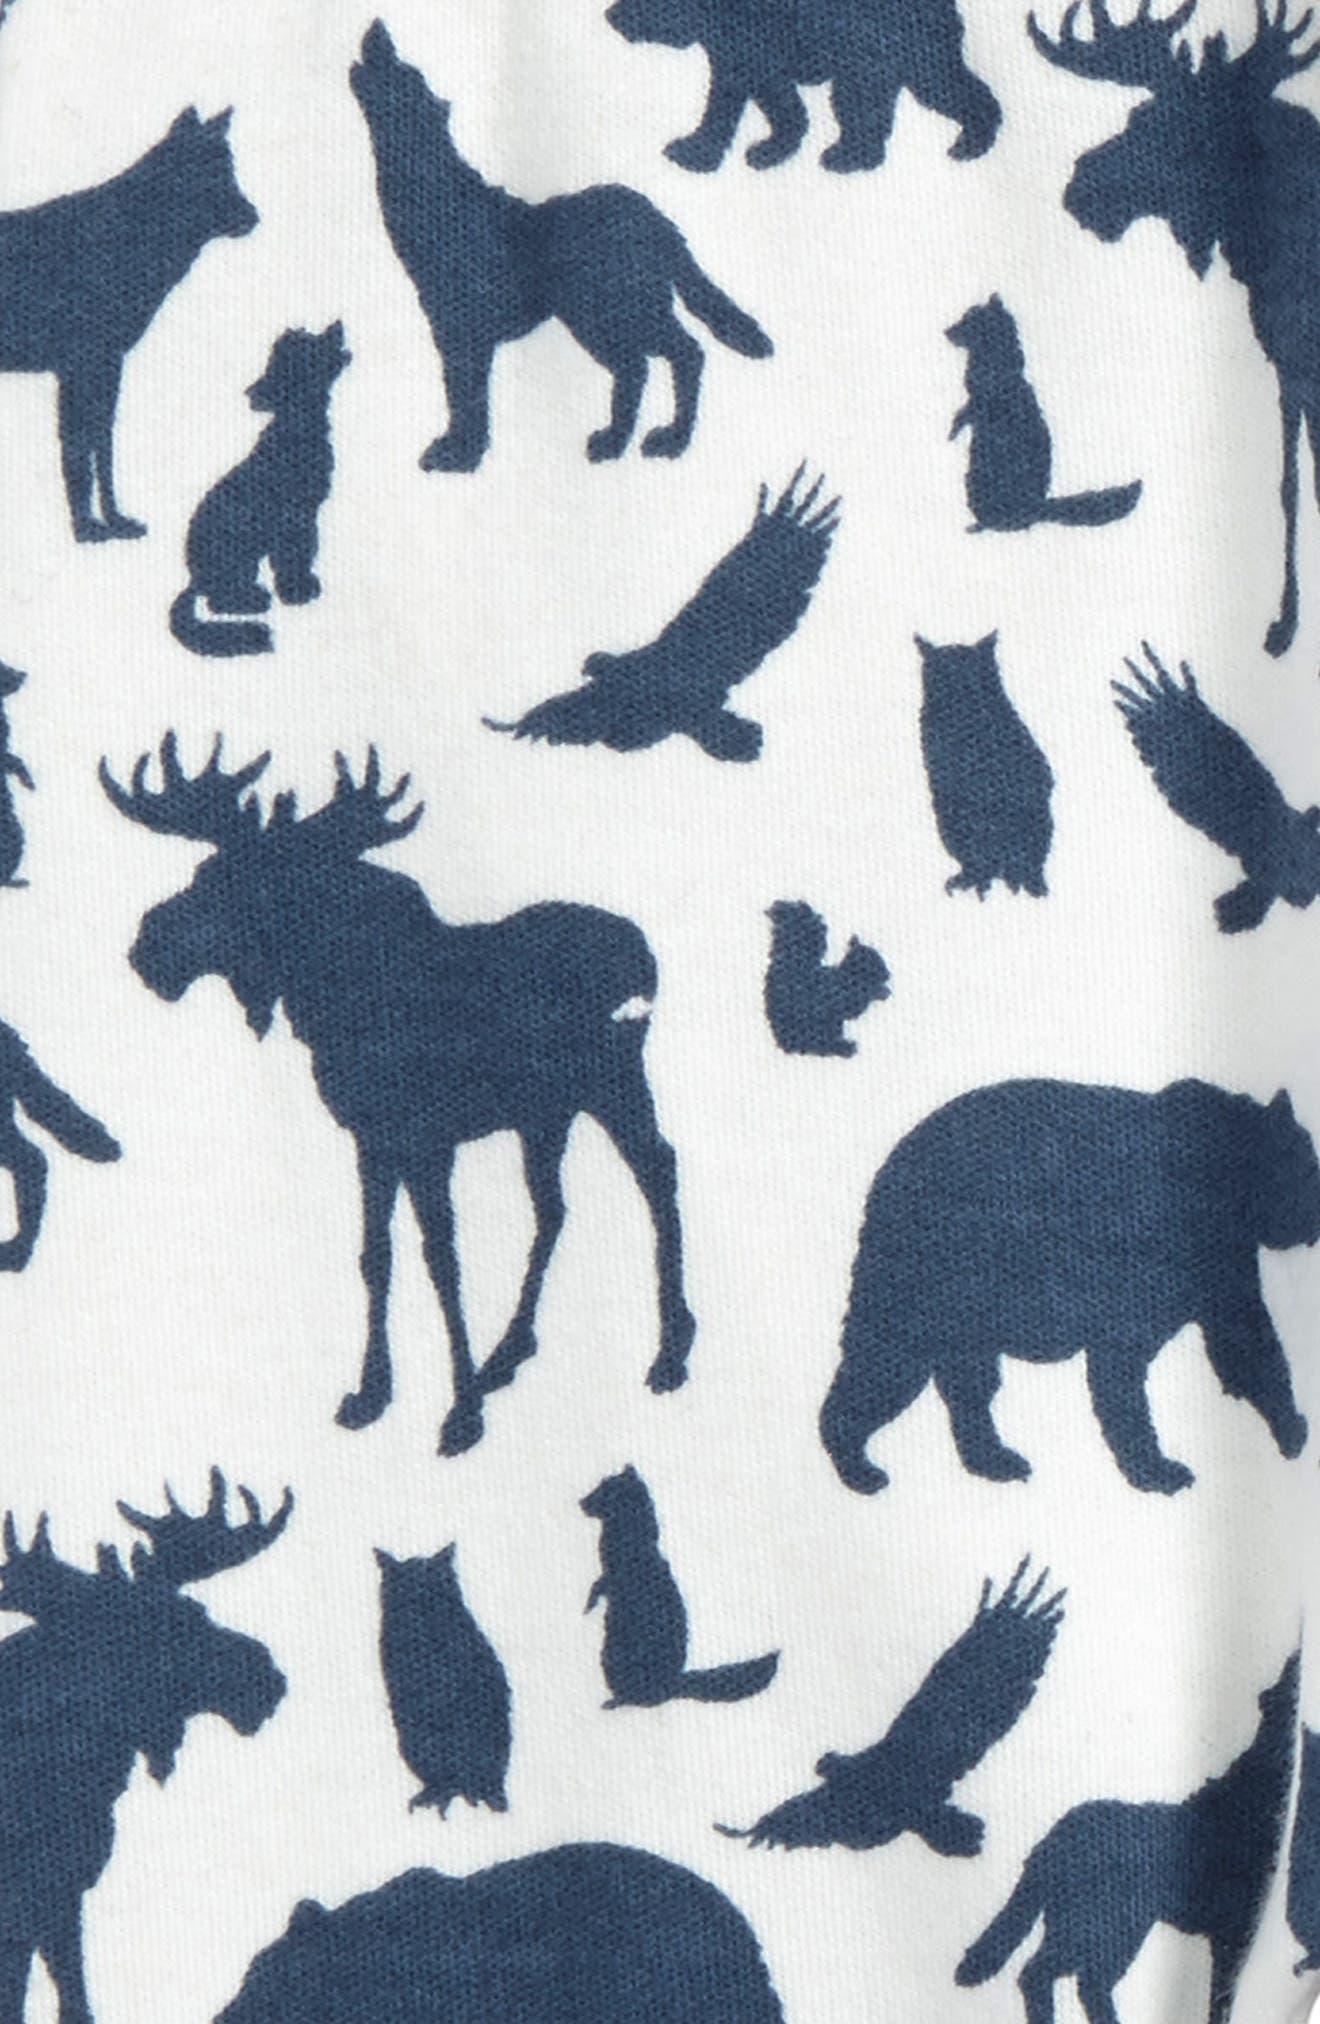 Animal Print Organic Cotton Jogger Pants,                             Alternate thumbnail 2, color,                             900